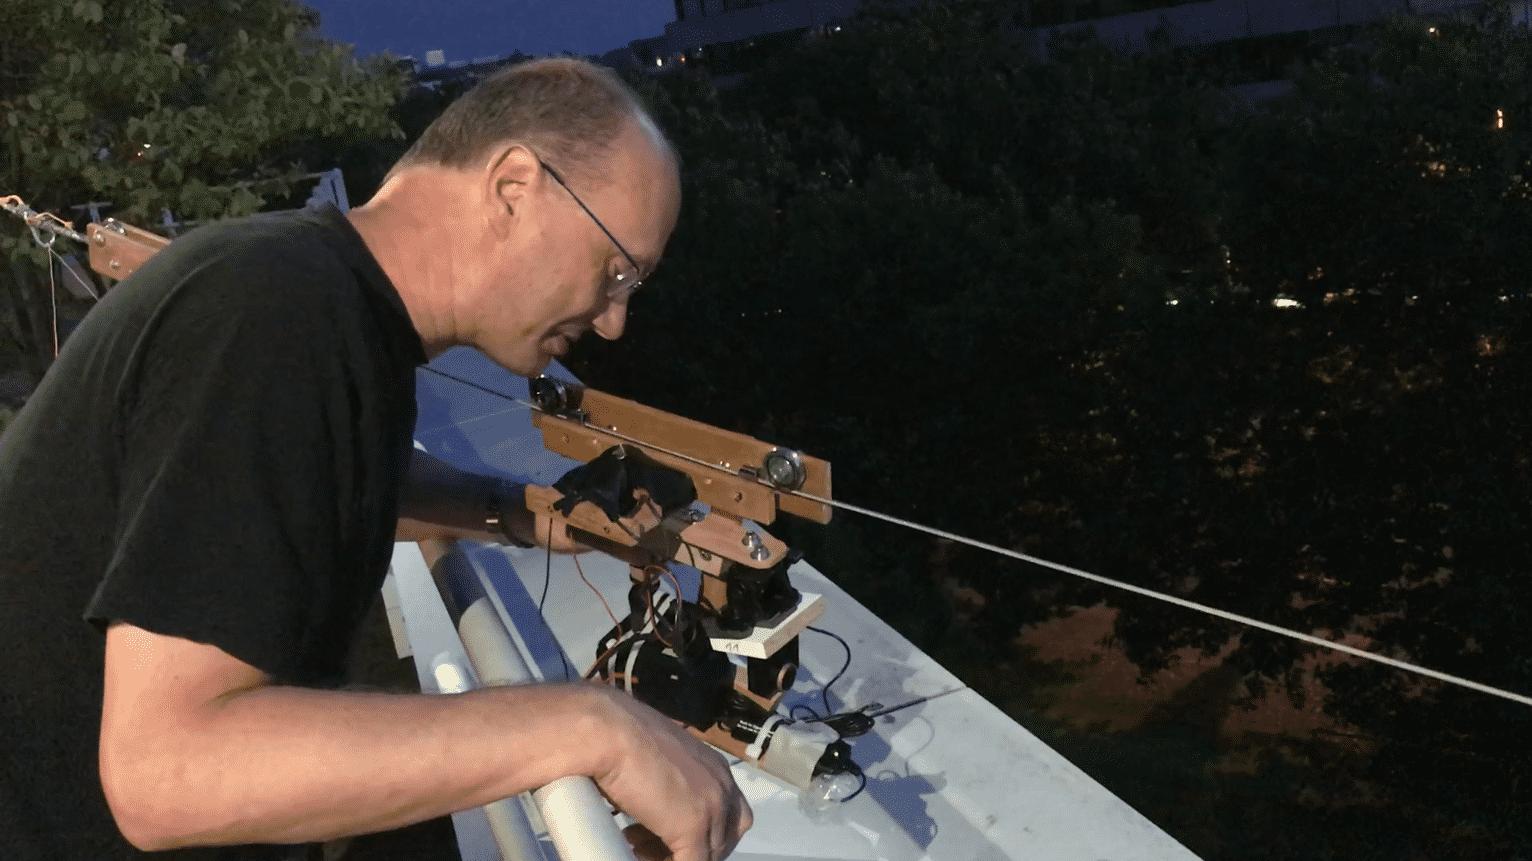 Dashcam in Action: Seilbahn-Abfahrt sumuliert Auffahrunfall